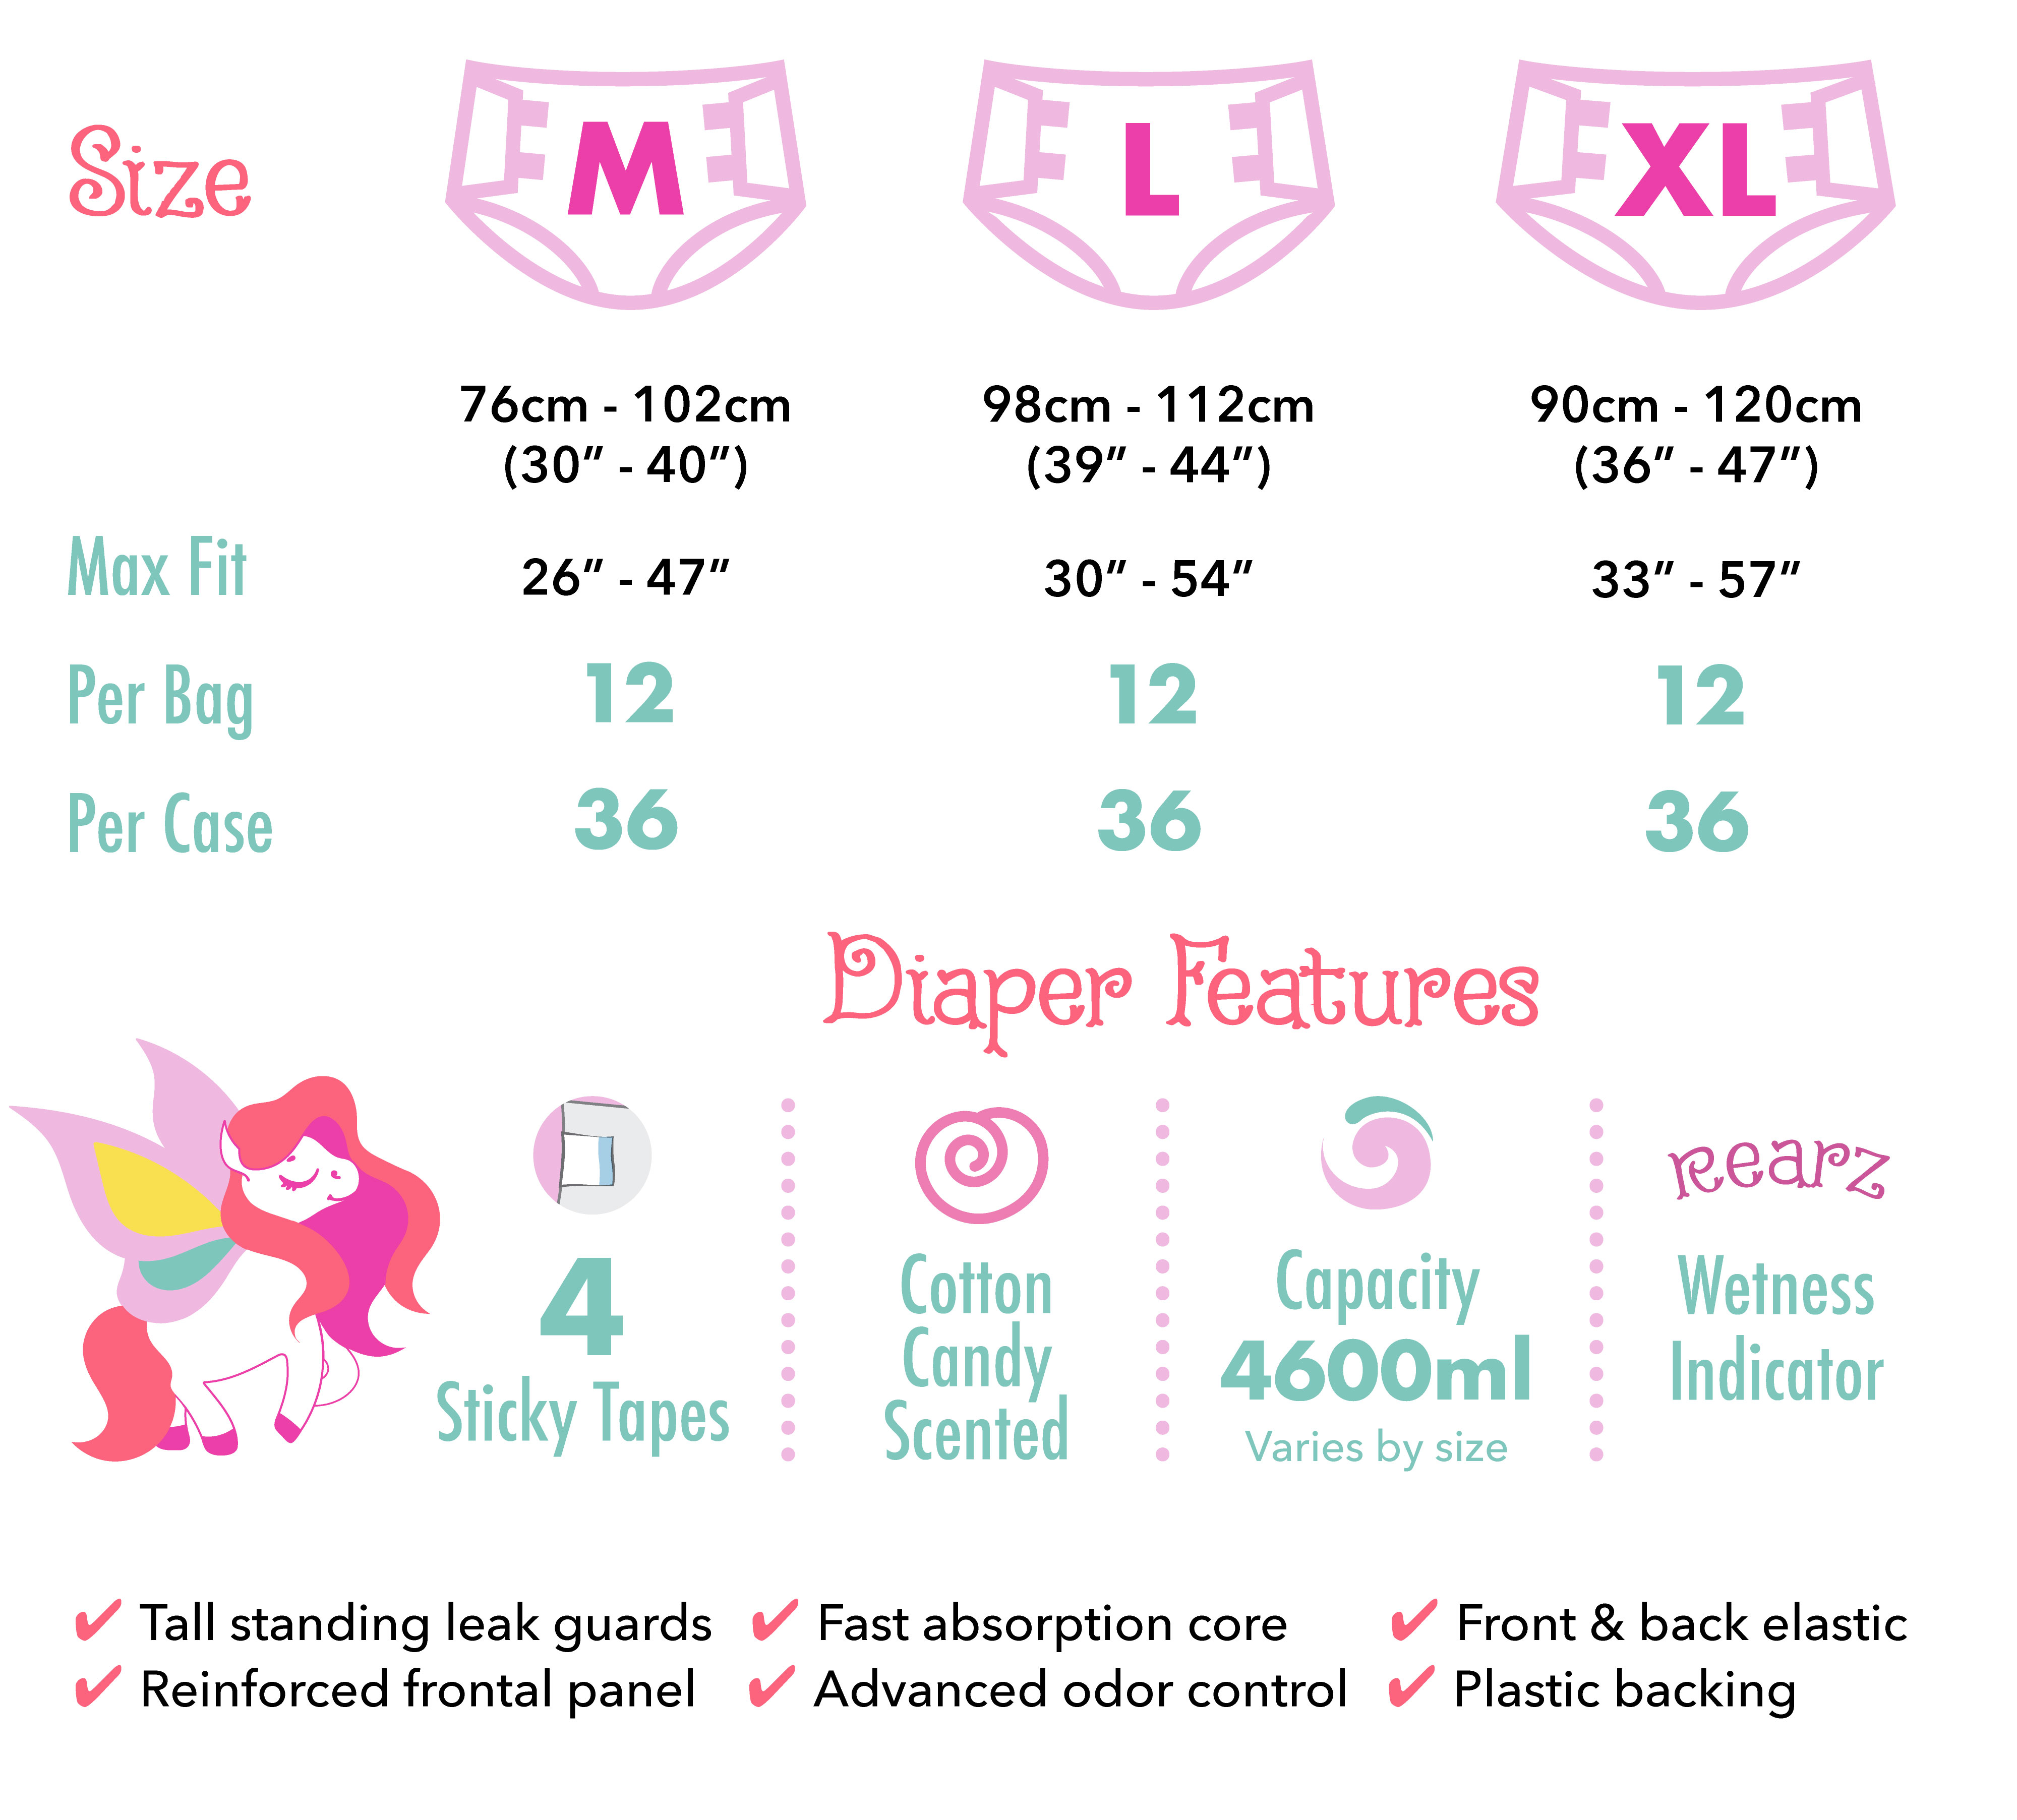 bella-infographic.jpg